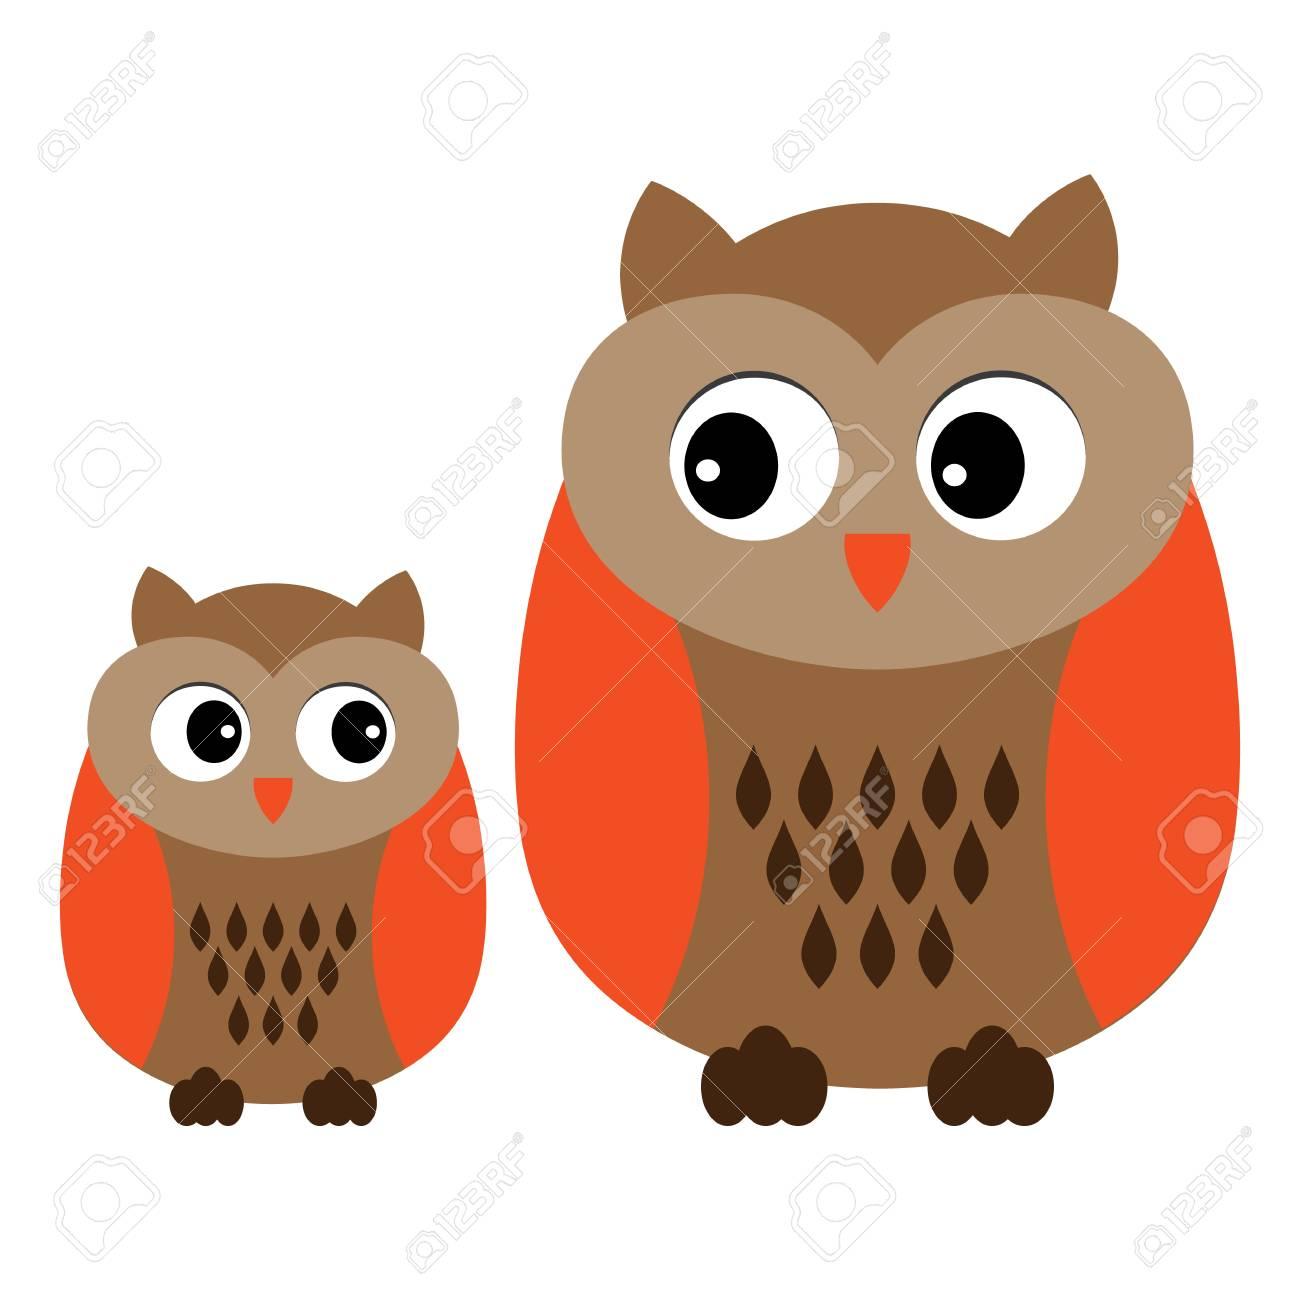 vector cute cartoon owls owls clipart baby owl vector illustration rh 123rf com baby girl owl clip art free baby shower owl clip art